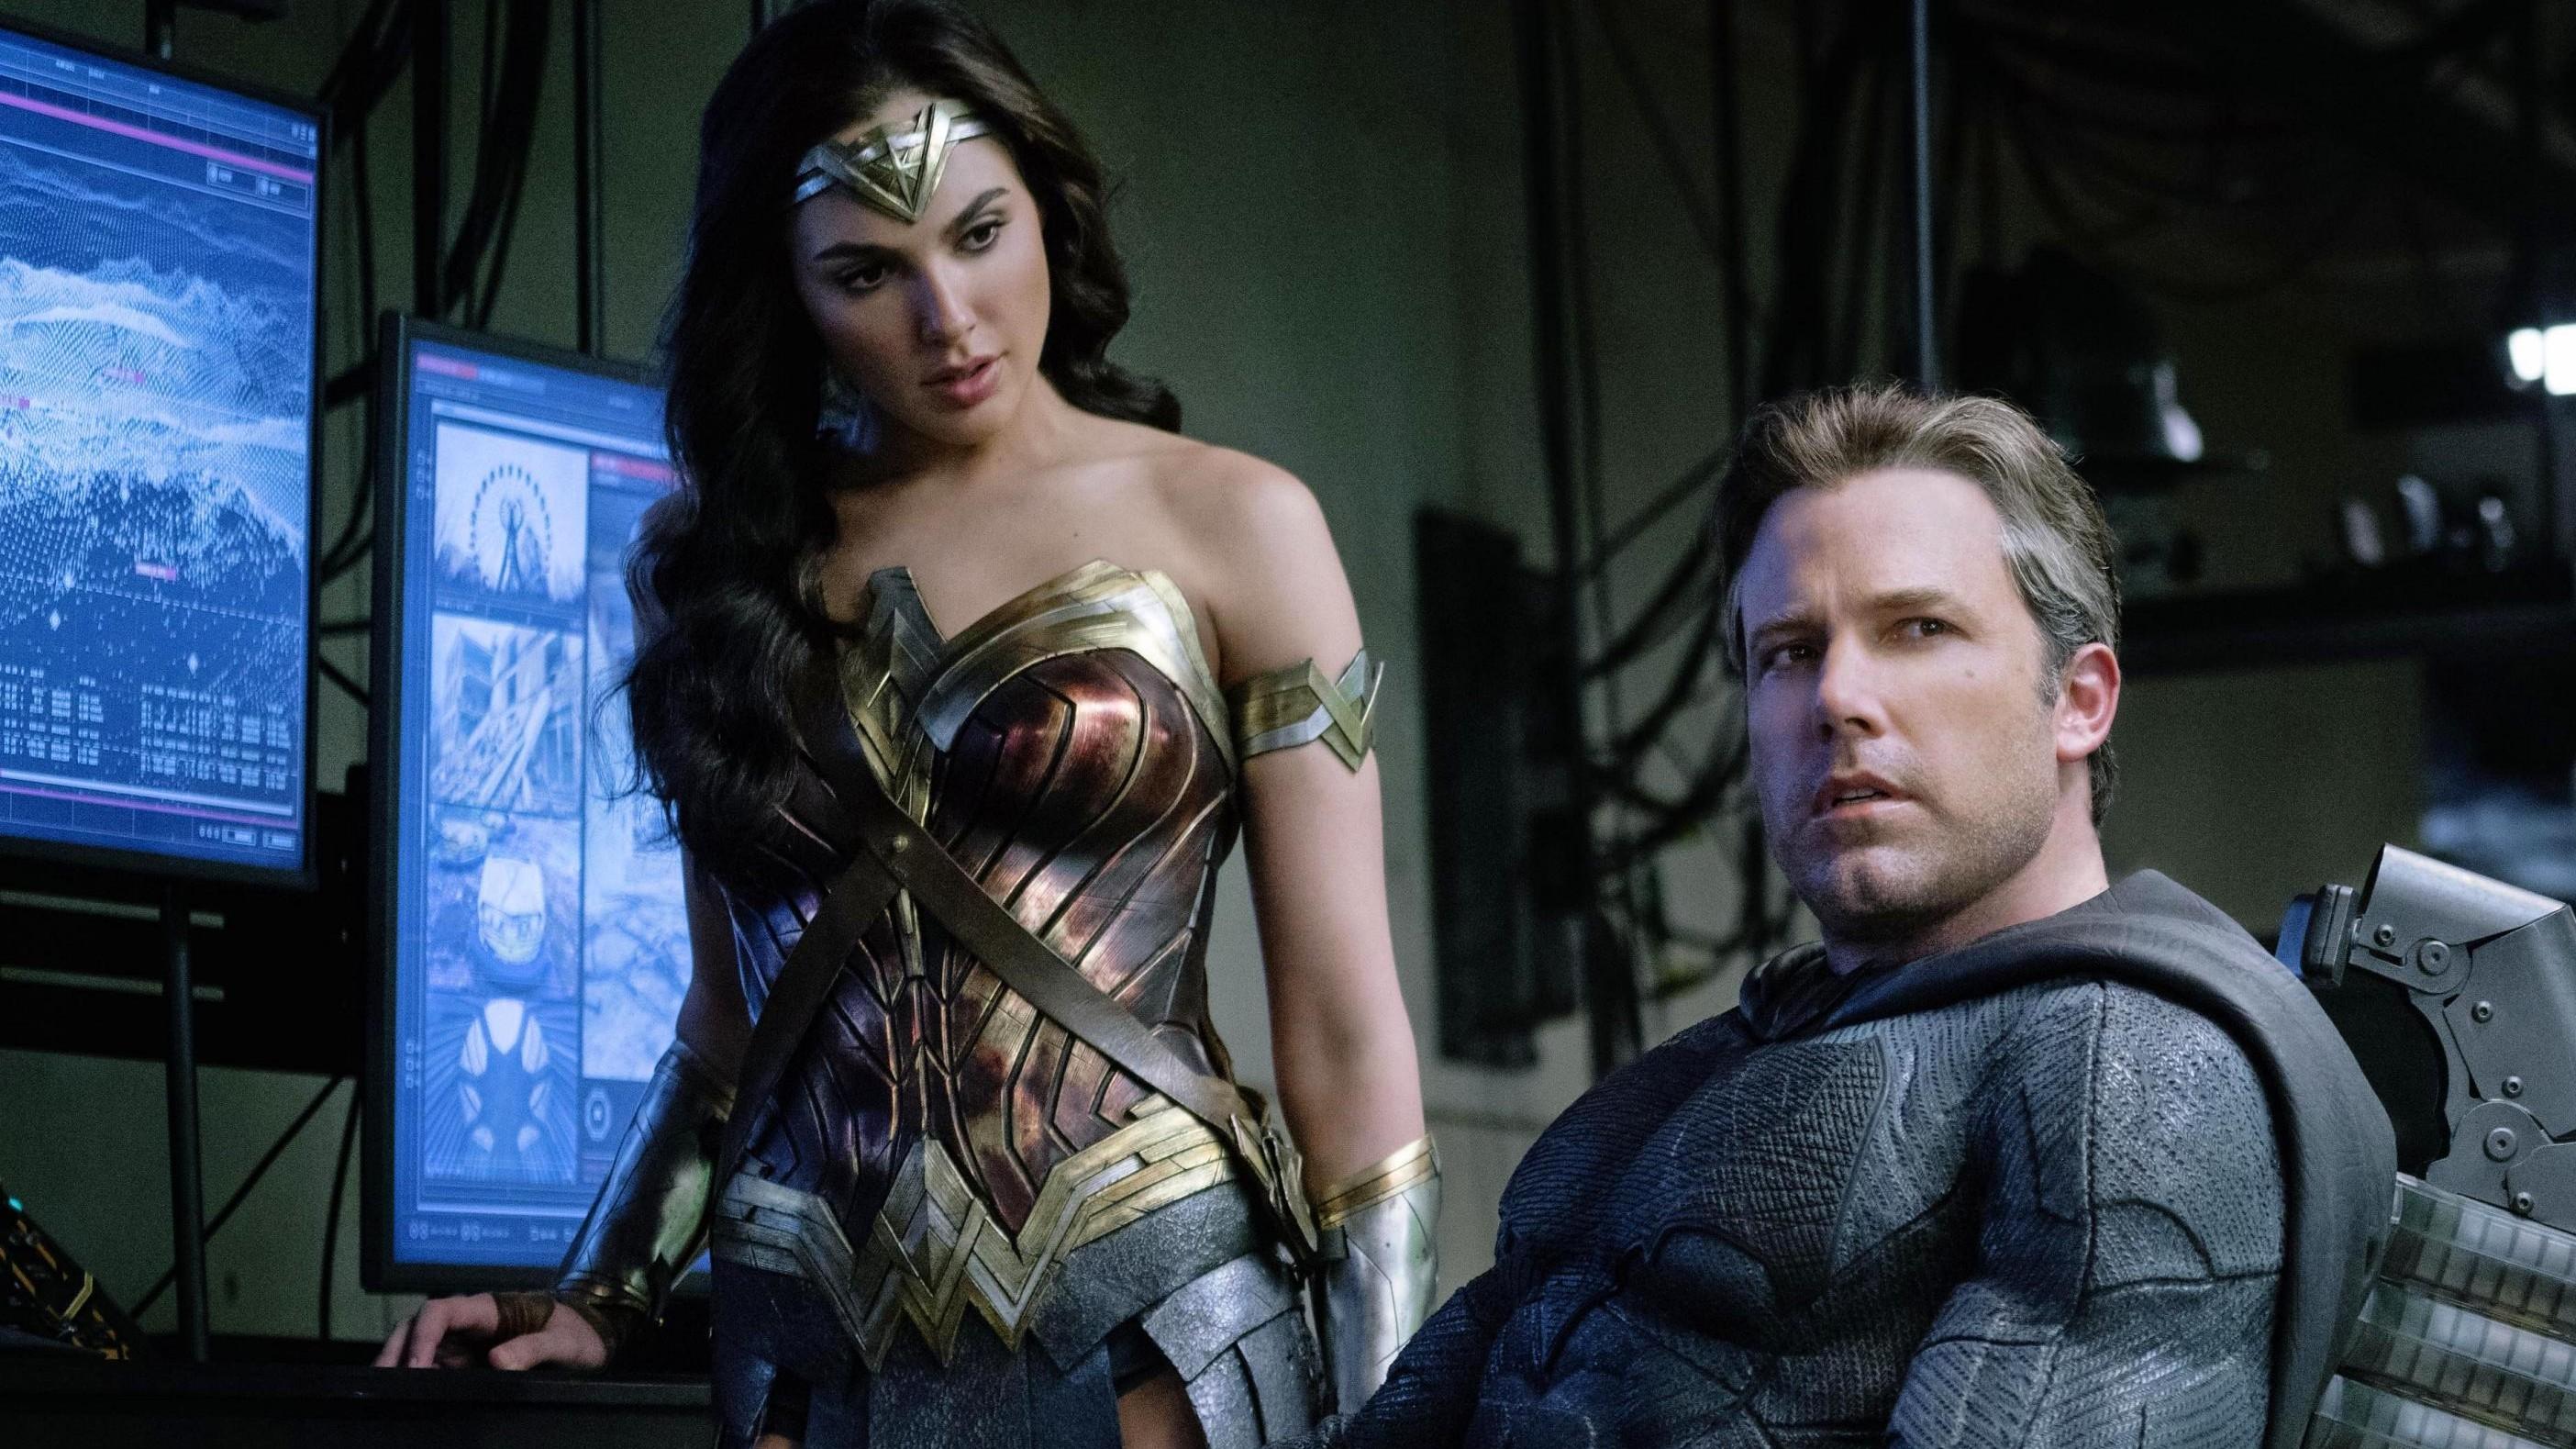 Justice-League-Ben-Affleck-Batman-Gal-Gadot-Wonder-Woman-F